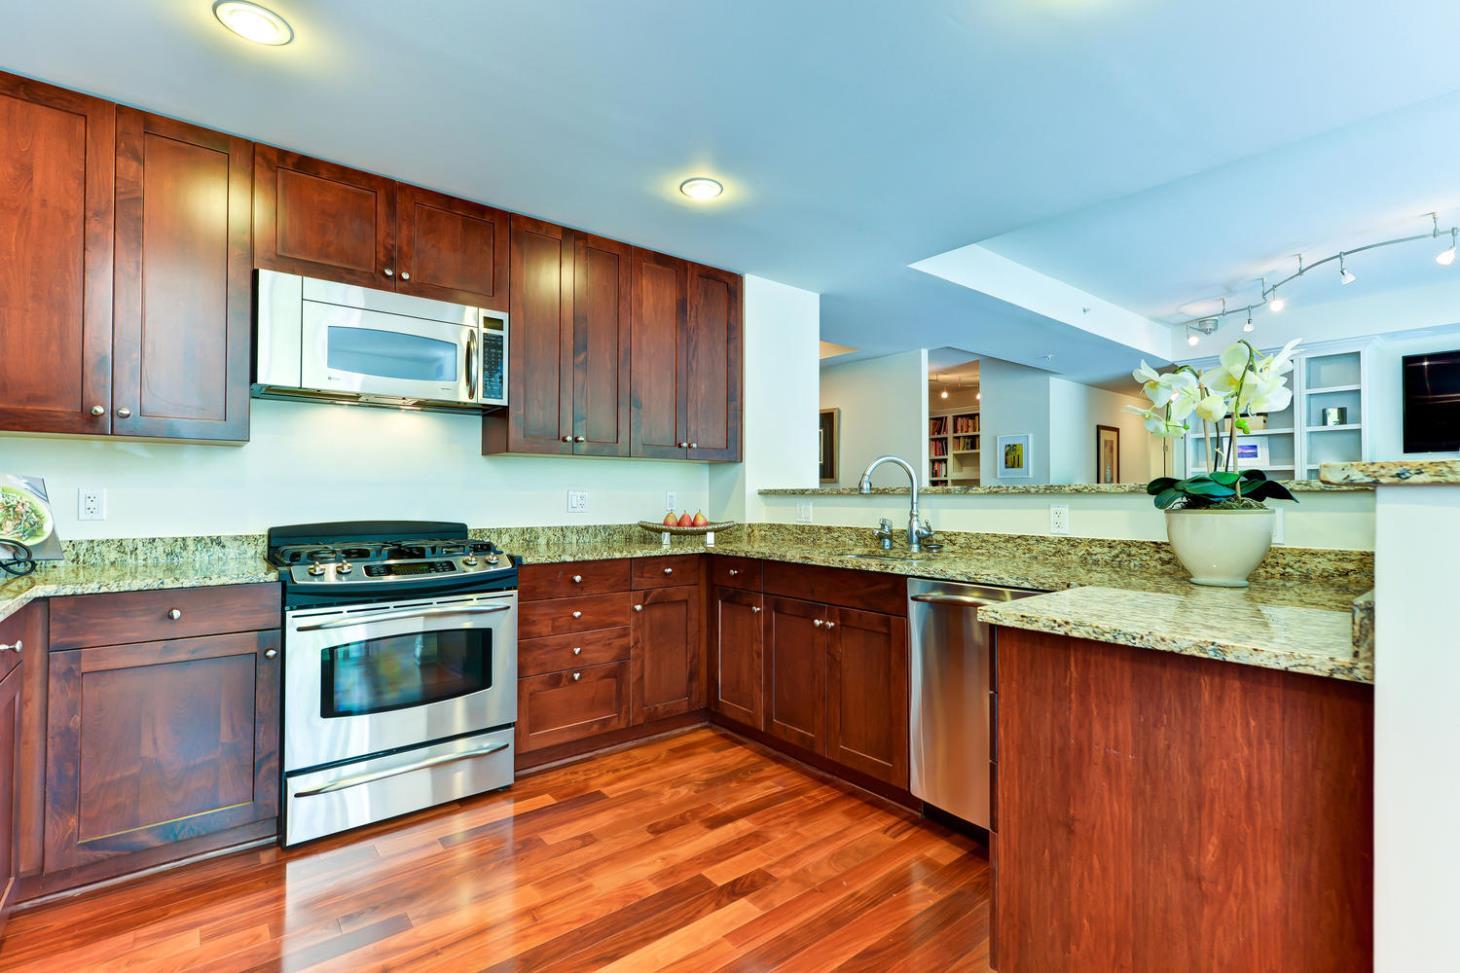 Virginia Home Design image 3